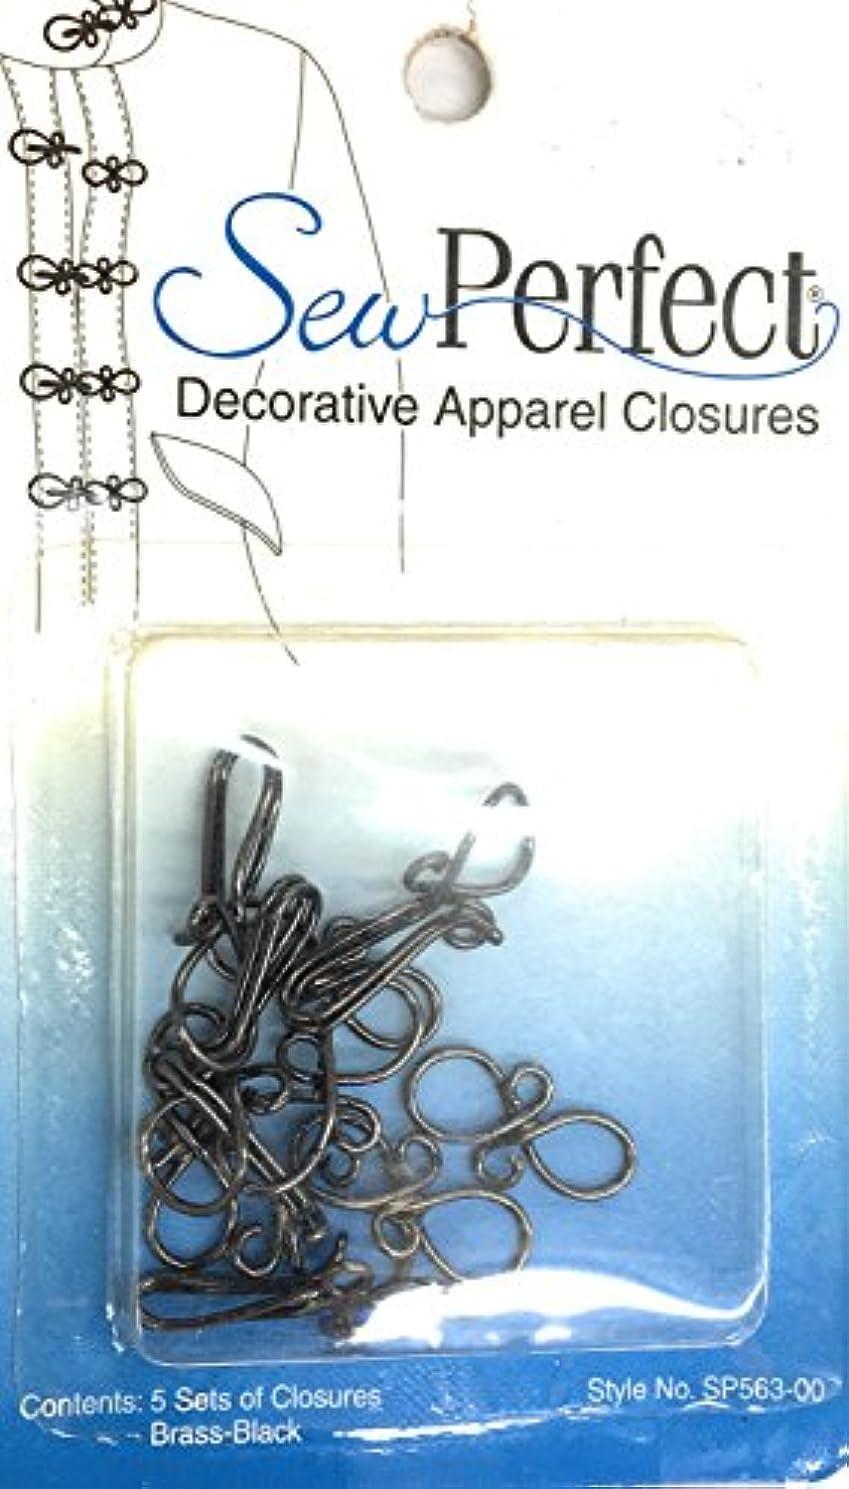 Decorative Hooks and Eyes, Sew Perfect Apparel Closures- Pewter GUN METAL